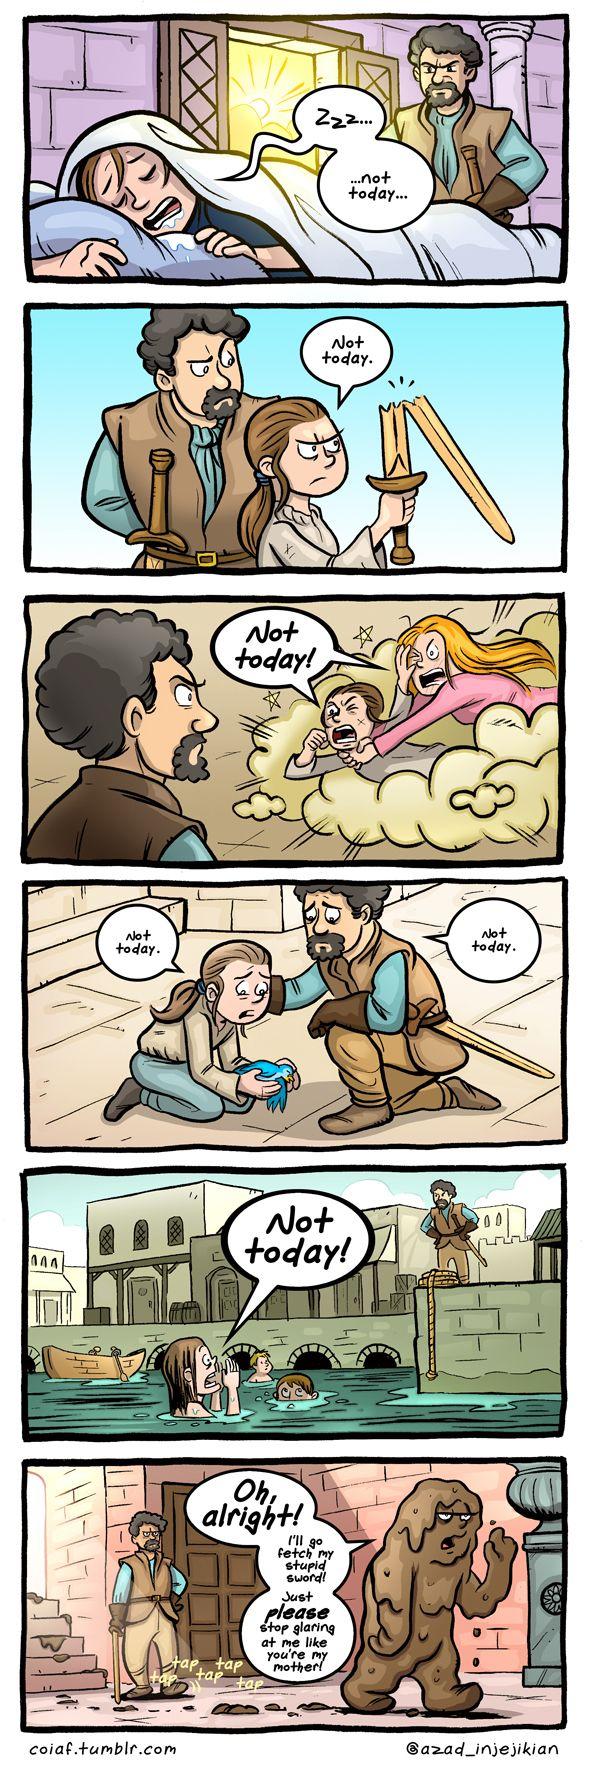 Lazy Arya - ASoIaF / Game of Thrones by Azad-Injejikian.deviantart.com on @deviantART